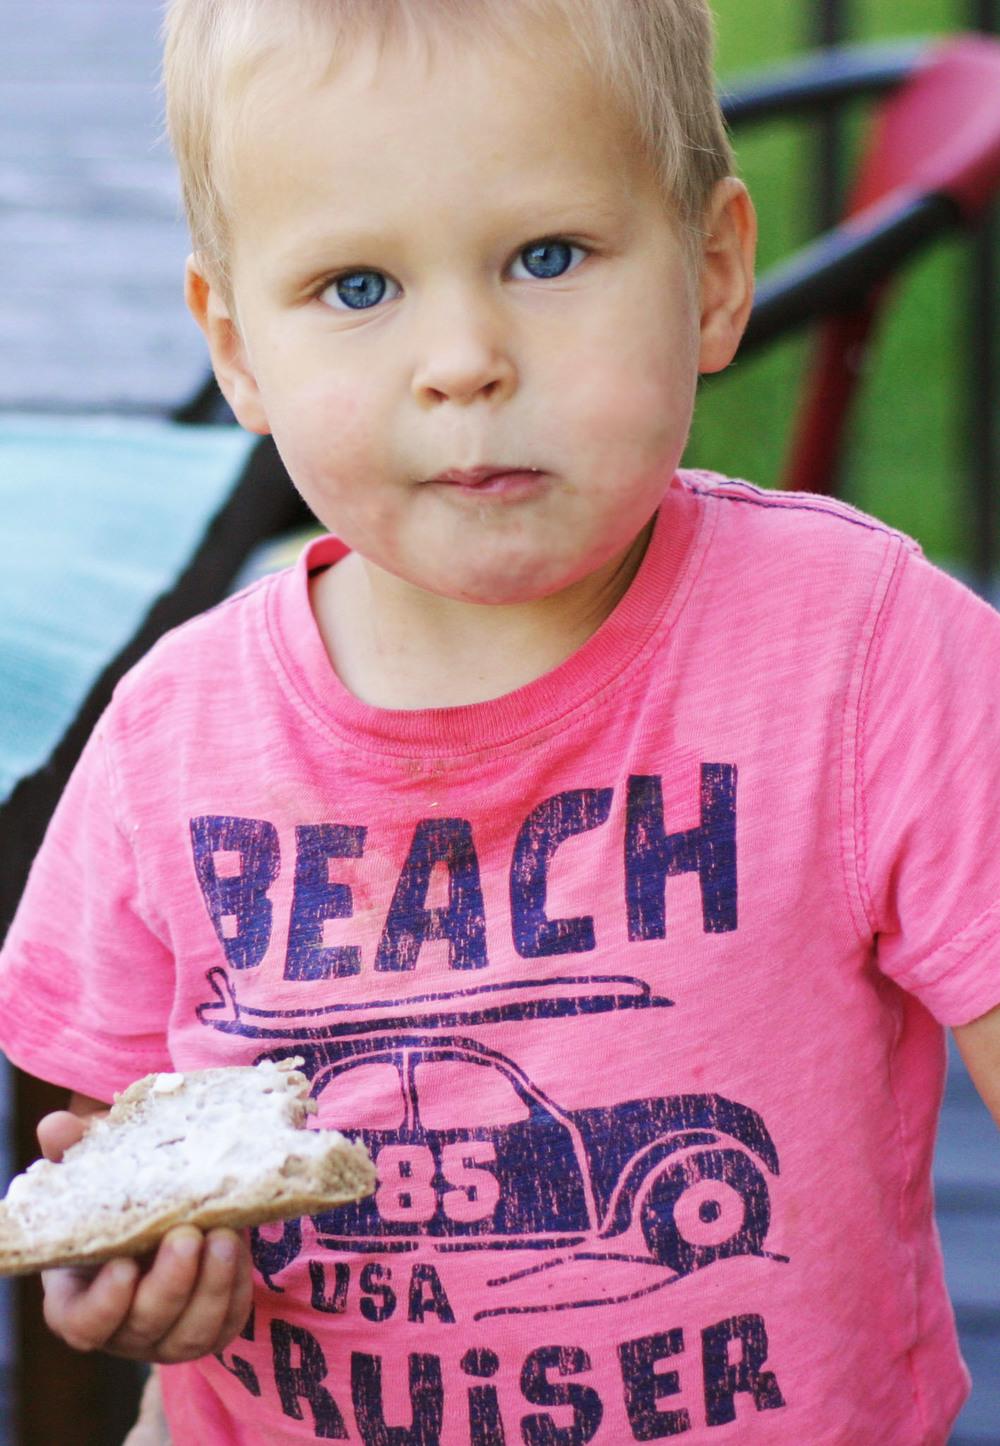 Levi always deconstructs his sandwiches.